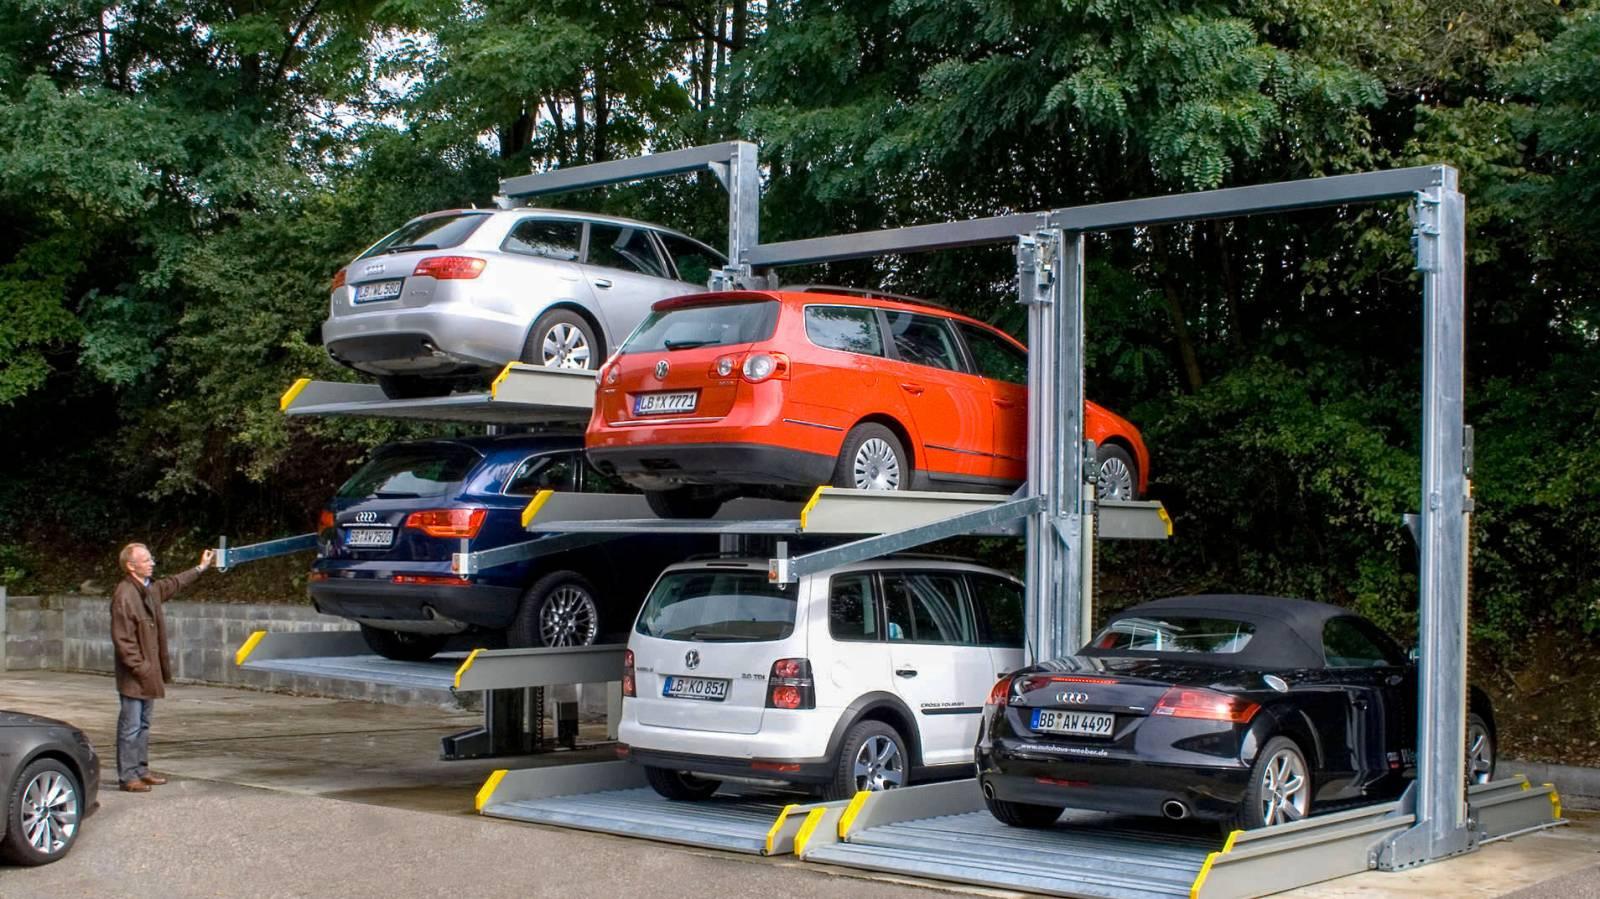 woehr-parklift421-autoparksystem-carparkingsystem-dependentparking-eb7e779c